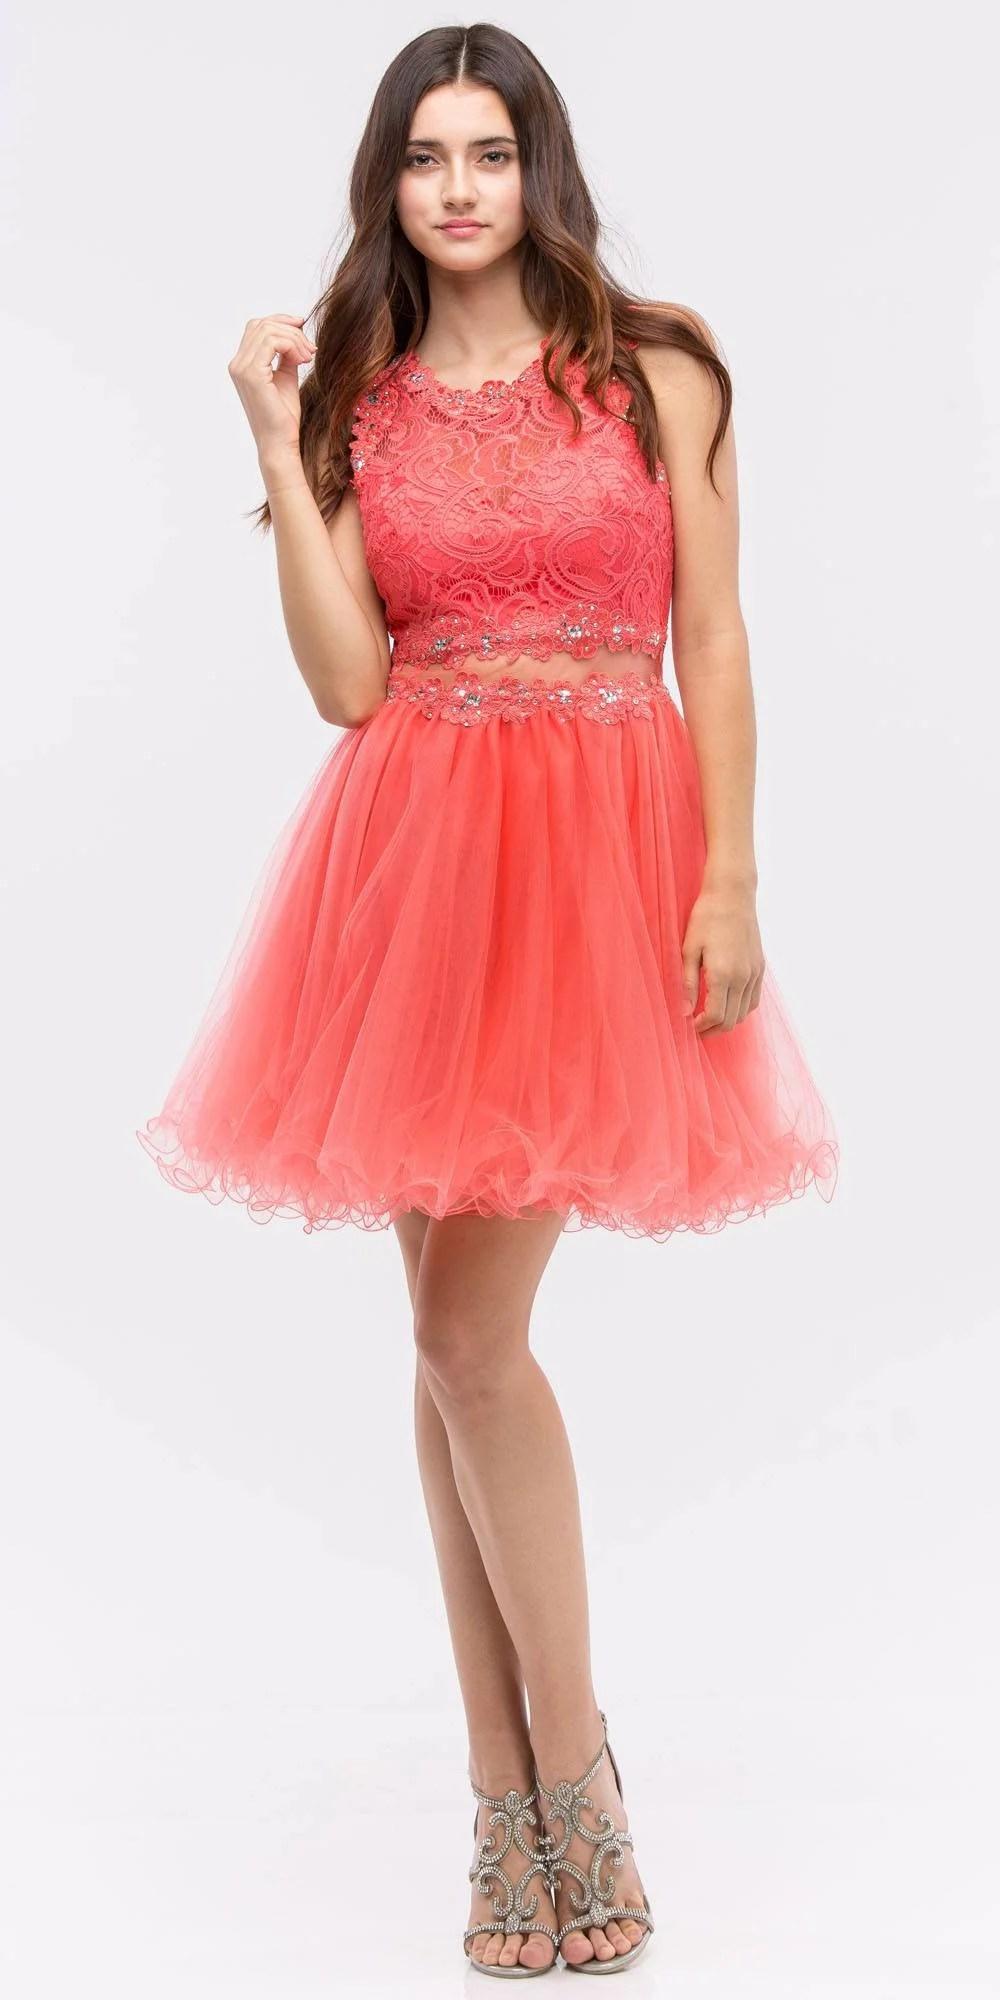 Short Poofy Prom Dresses 2 Piece Burgundy